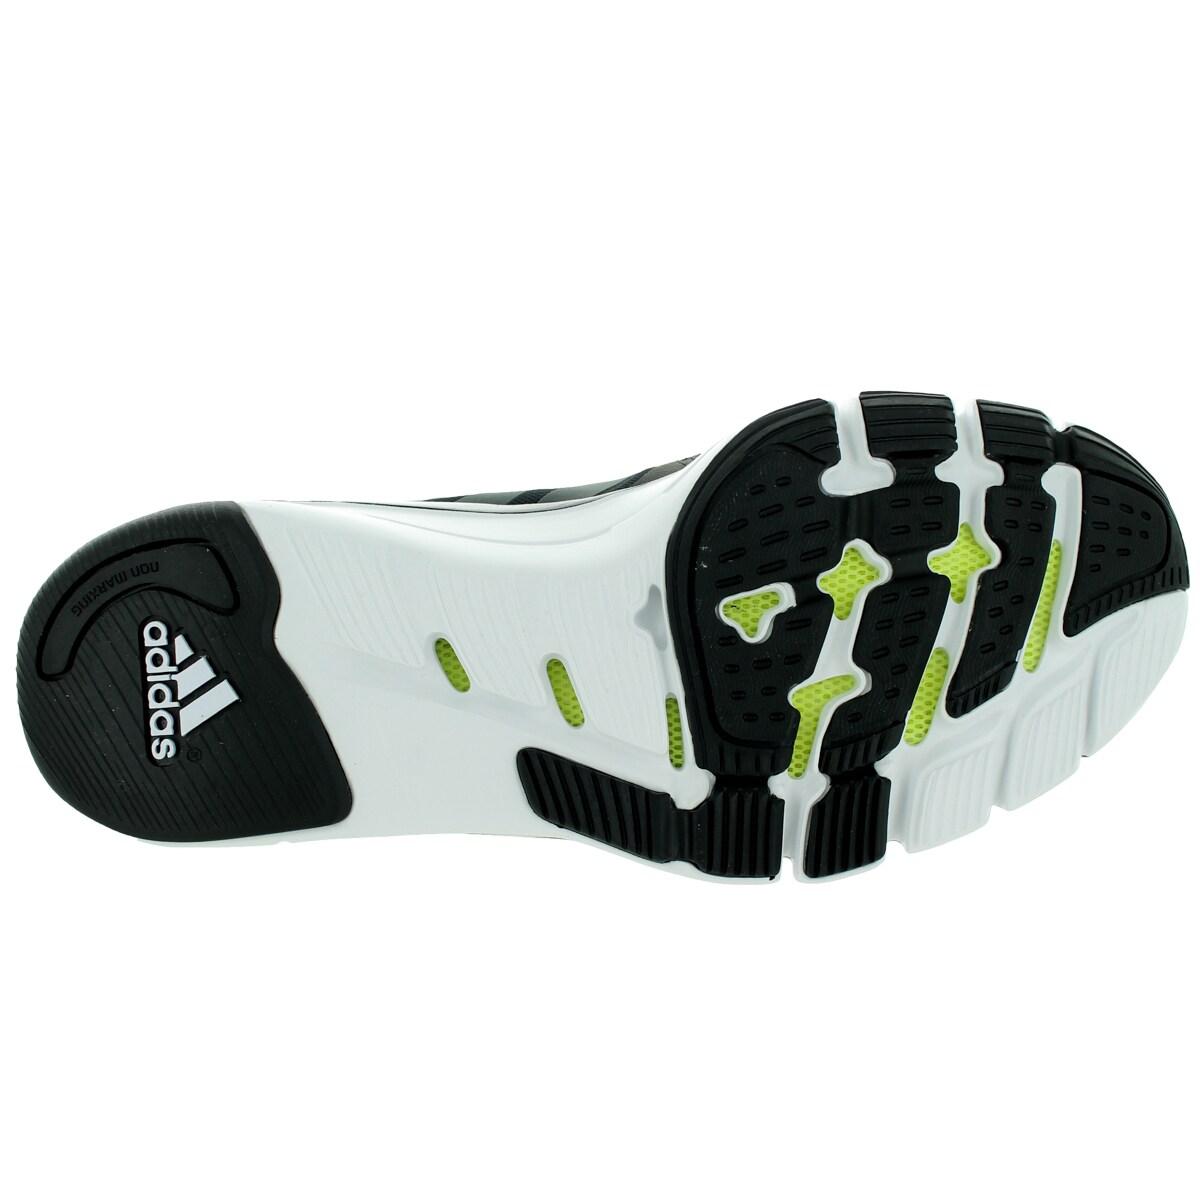 3eadef3b344e0 Shop Adidas Women s Adipure 360.3 W Black White Lava Glow Running Shoe -  Free Shipping Today - Overstock - 12175232